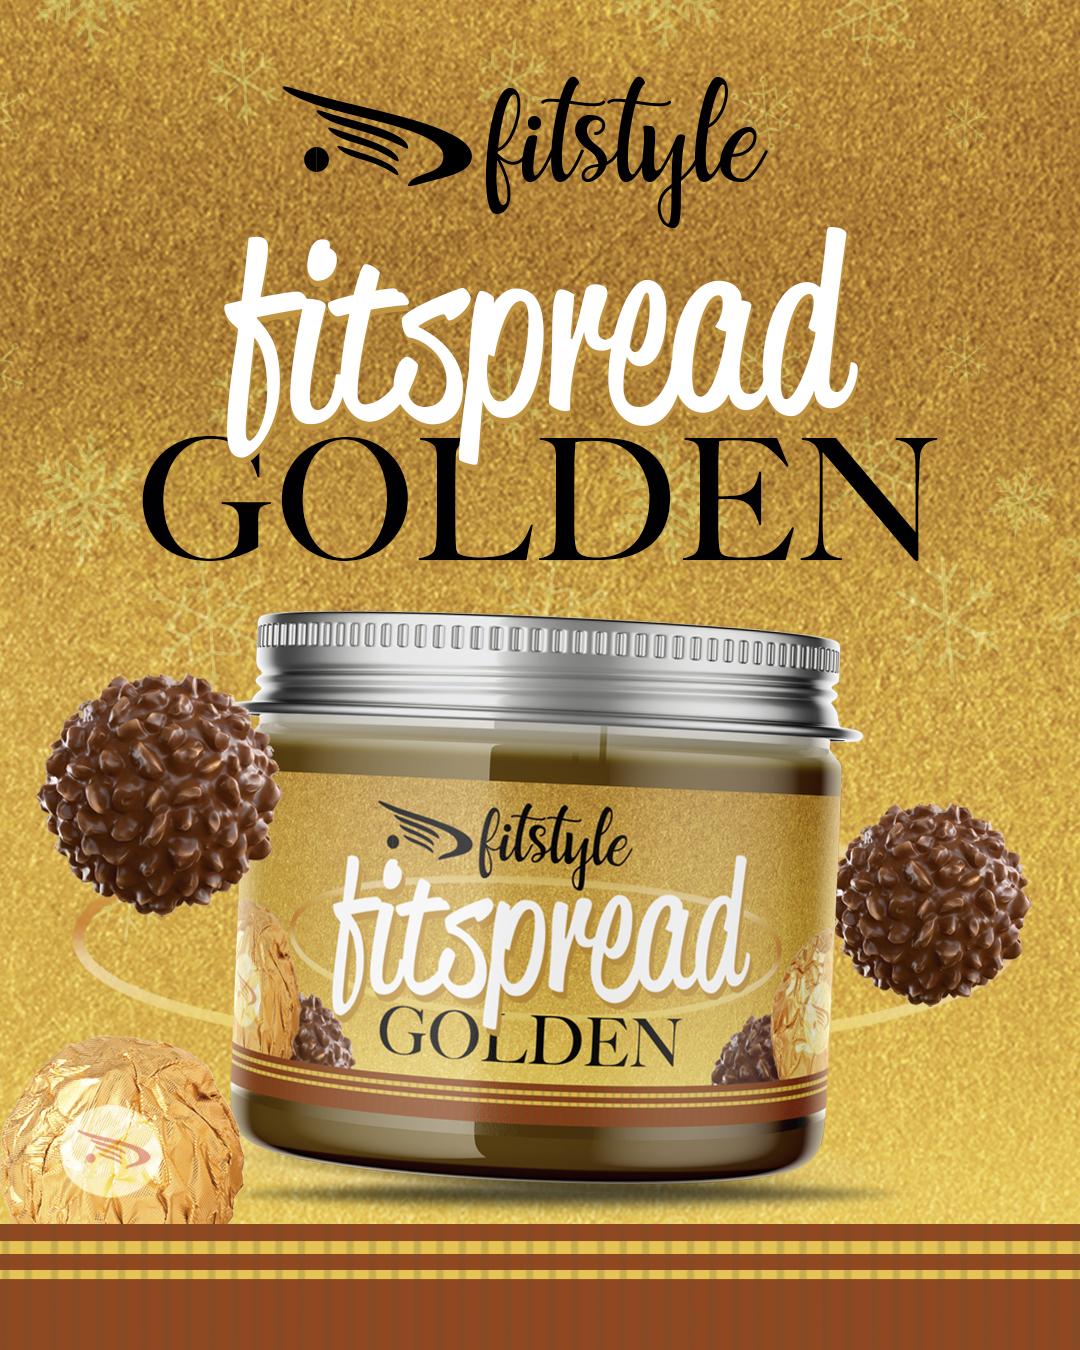 FITspread GOLDEN 200g FITSTYLE